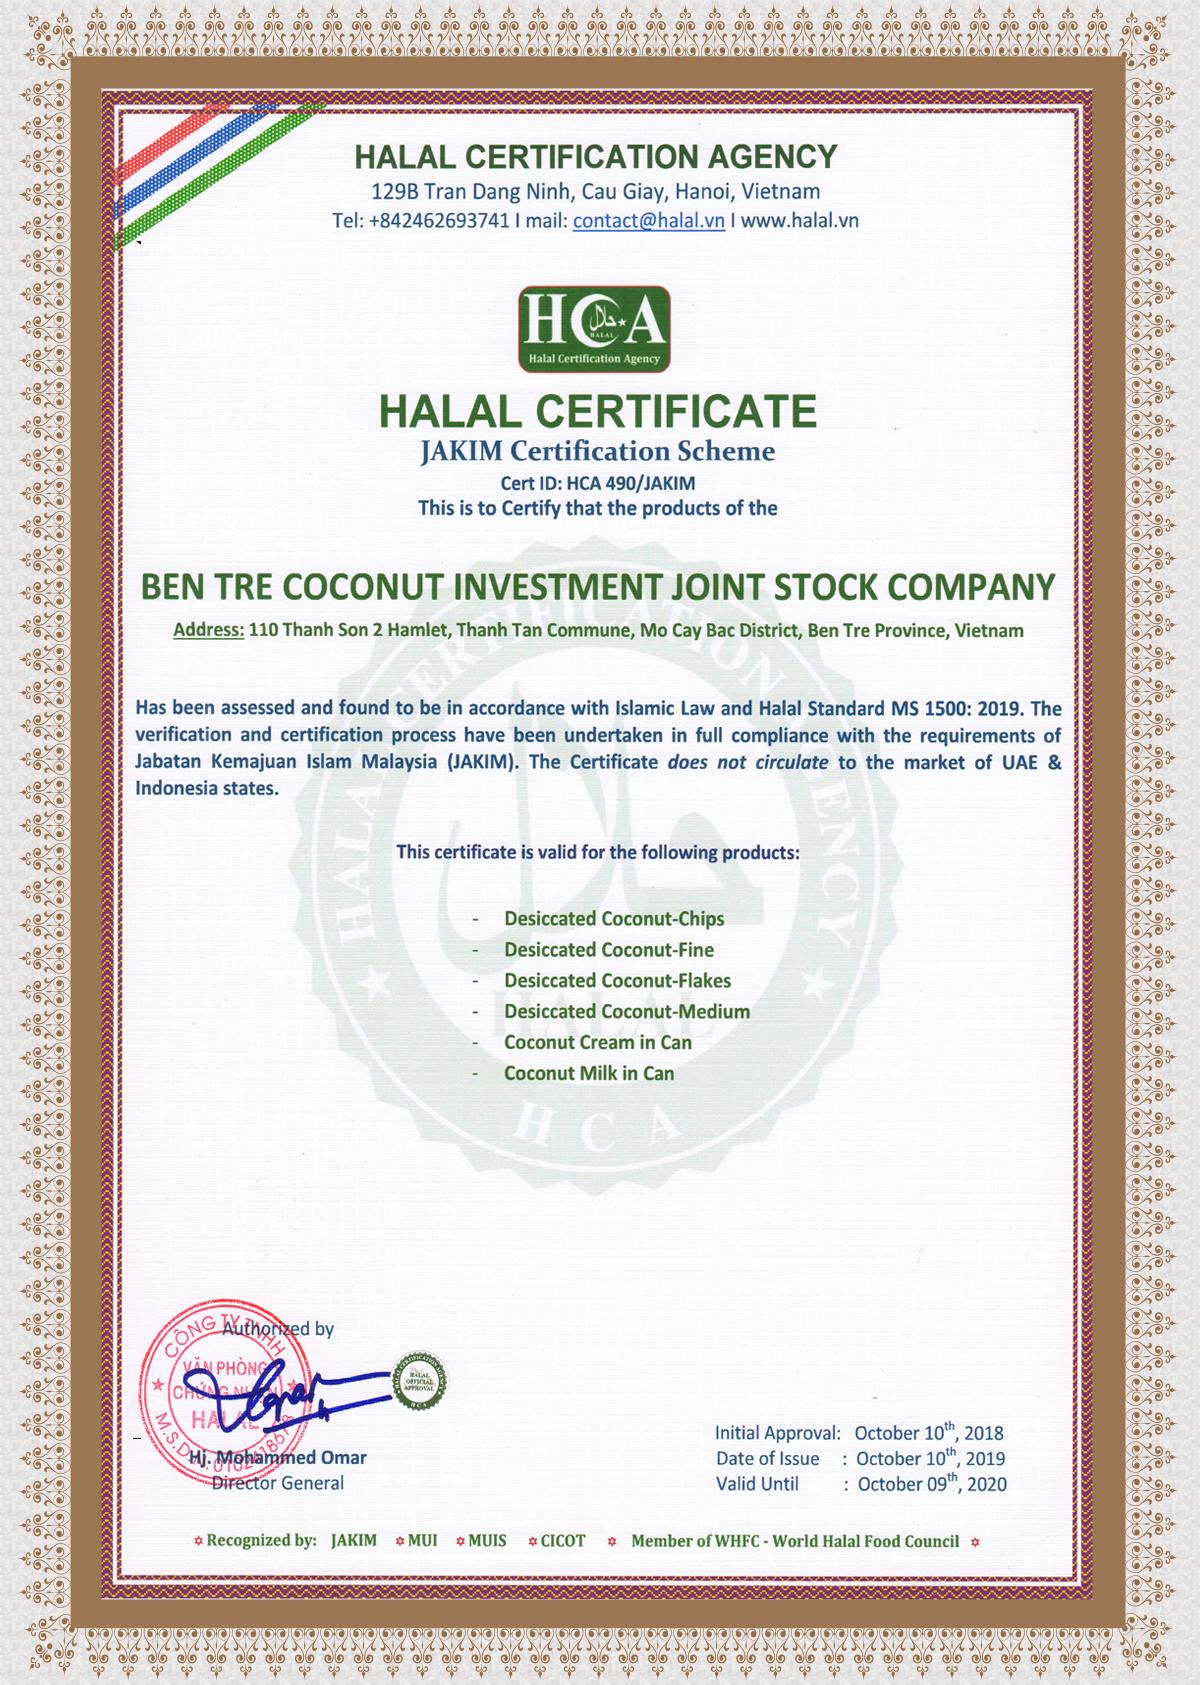 HALAL CERTIFICATION (JAKIM)